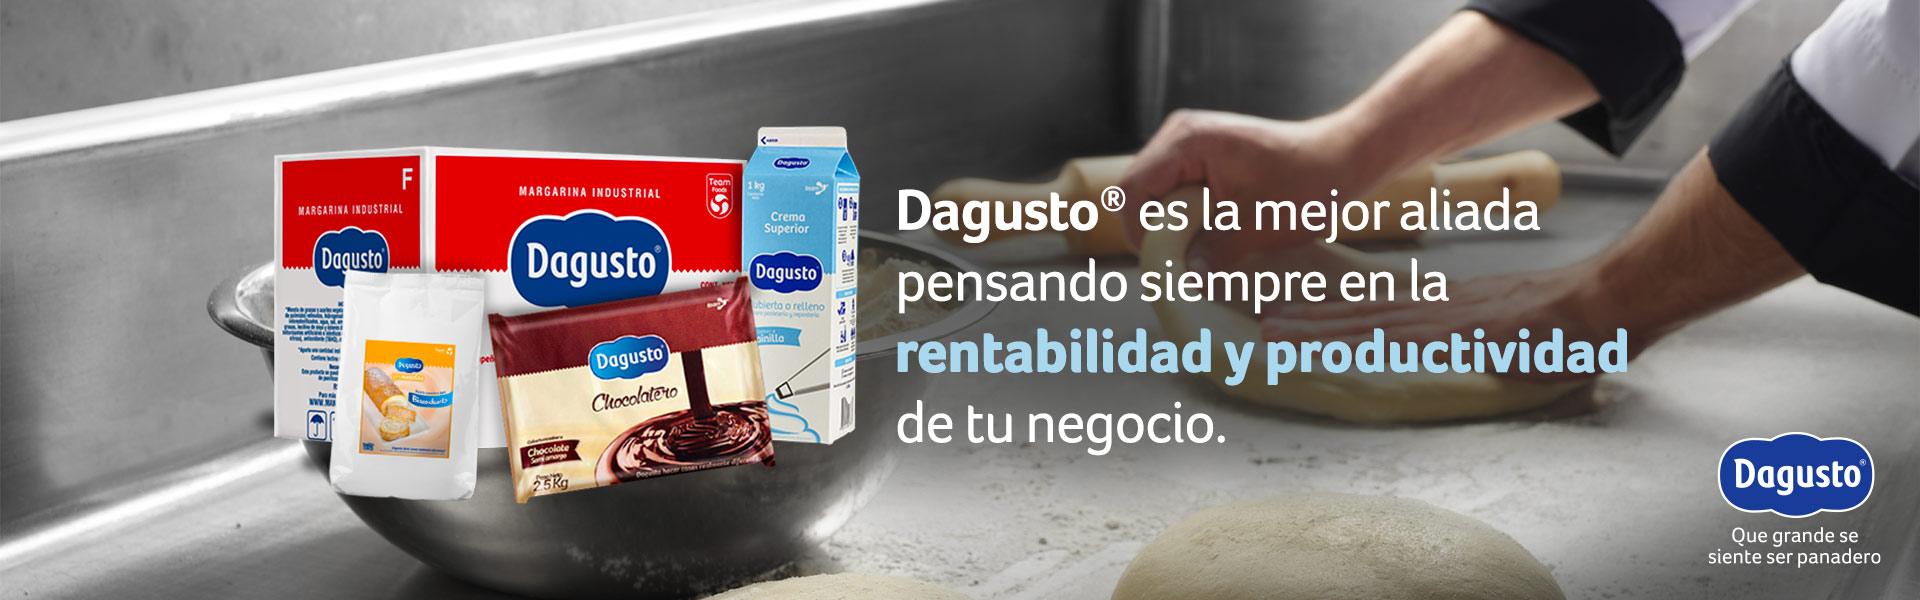 Banners-Dagusto